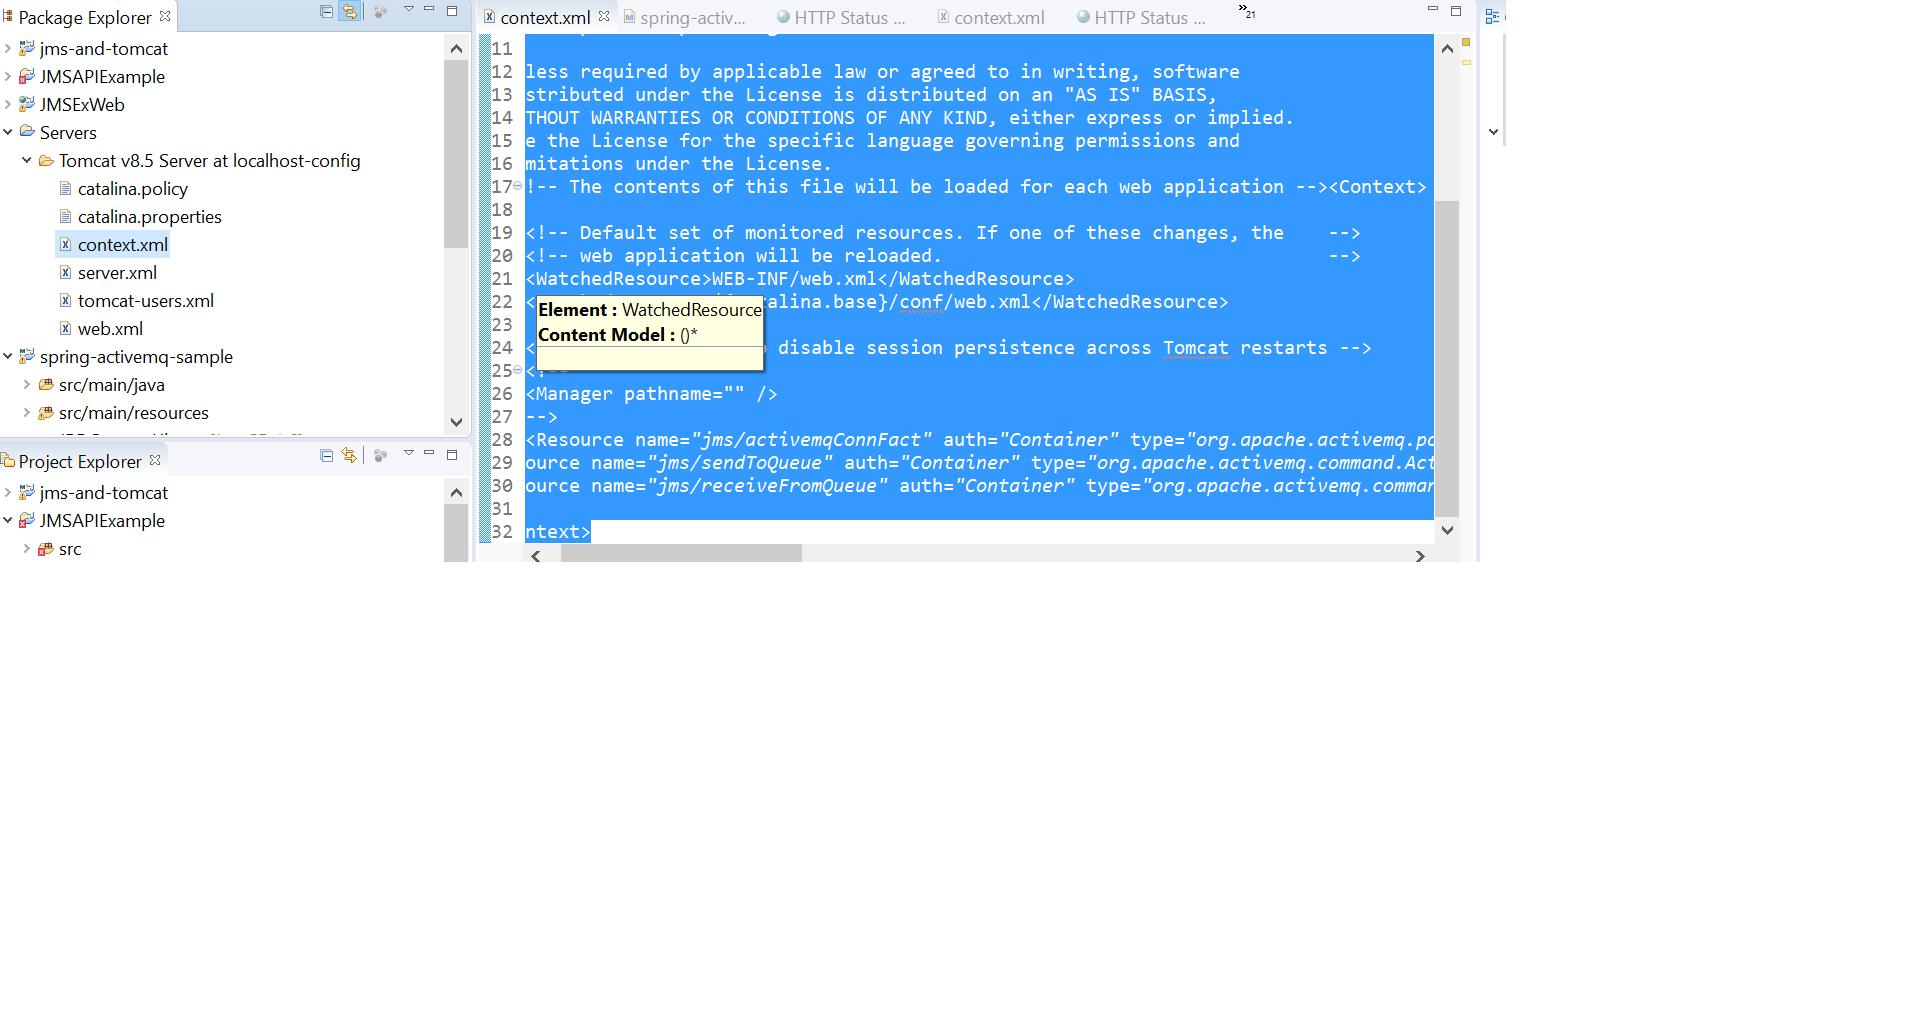 jms example error